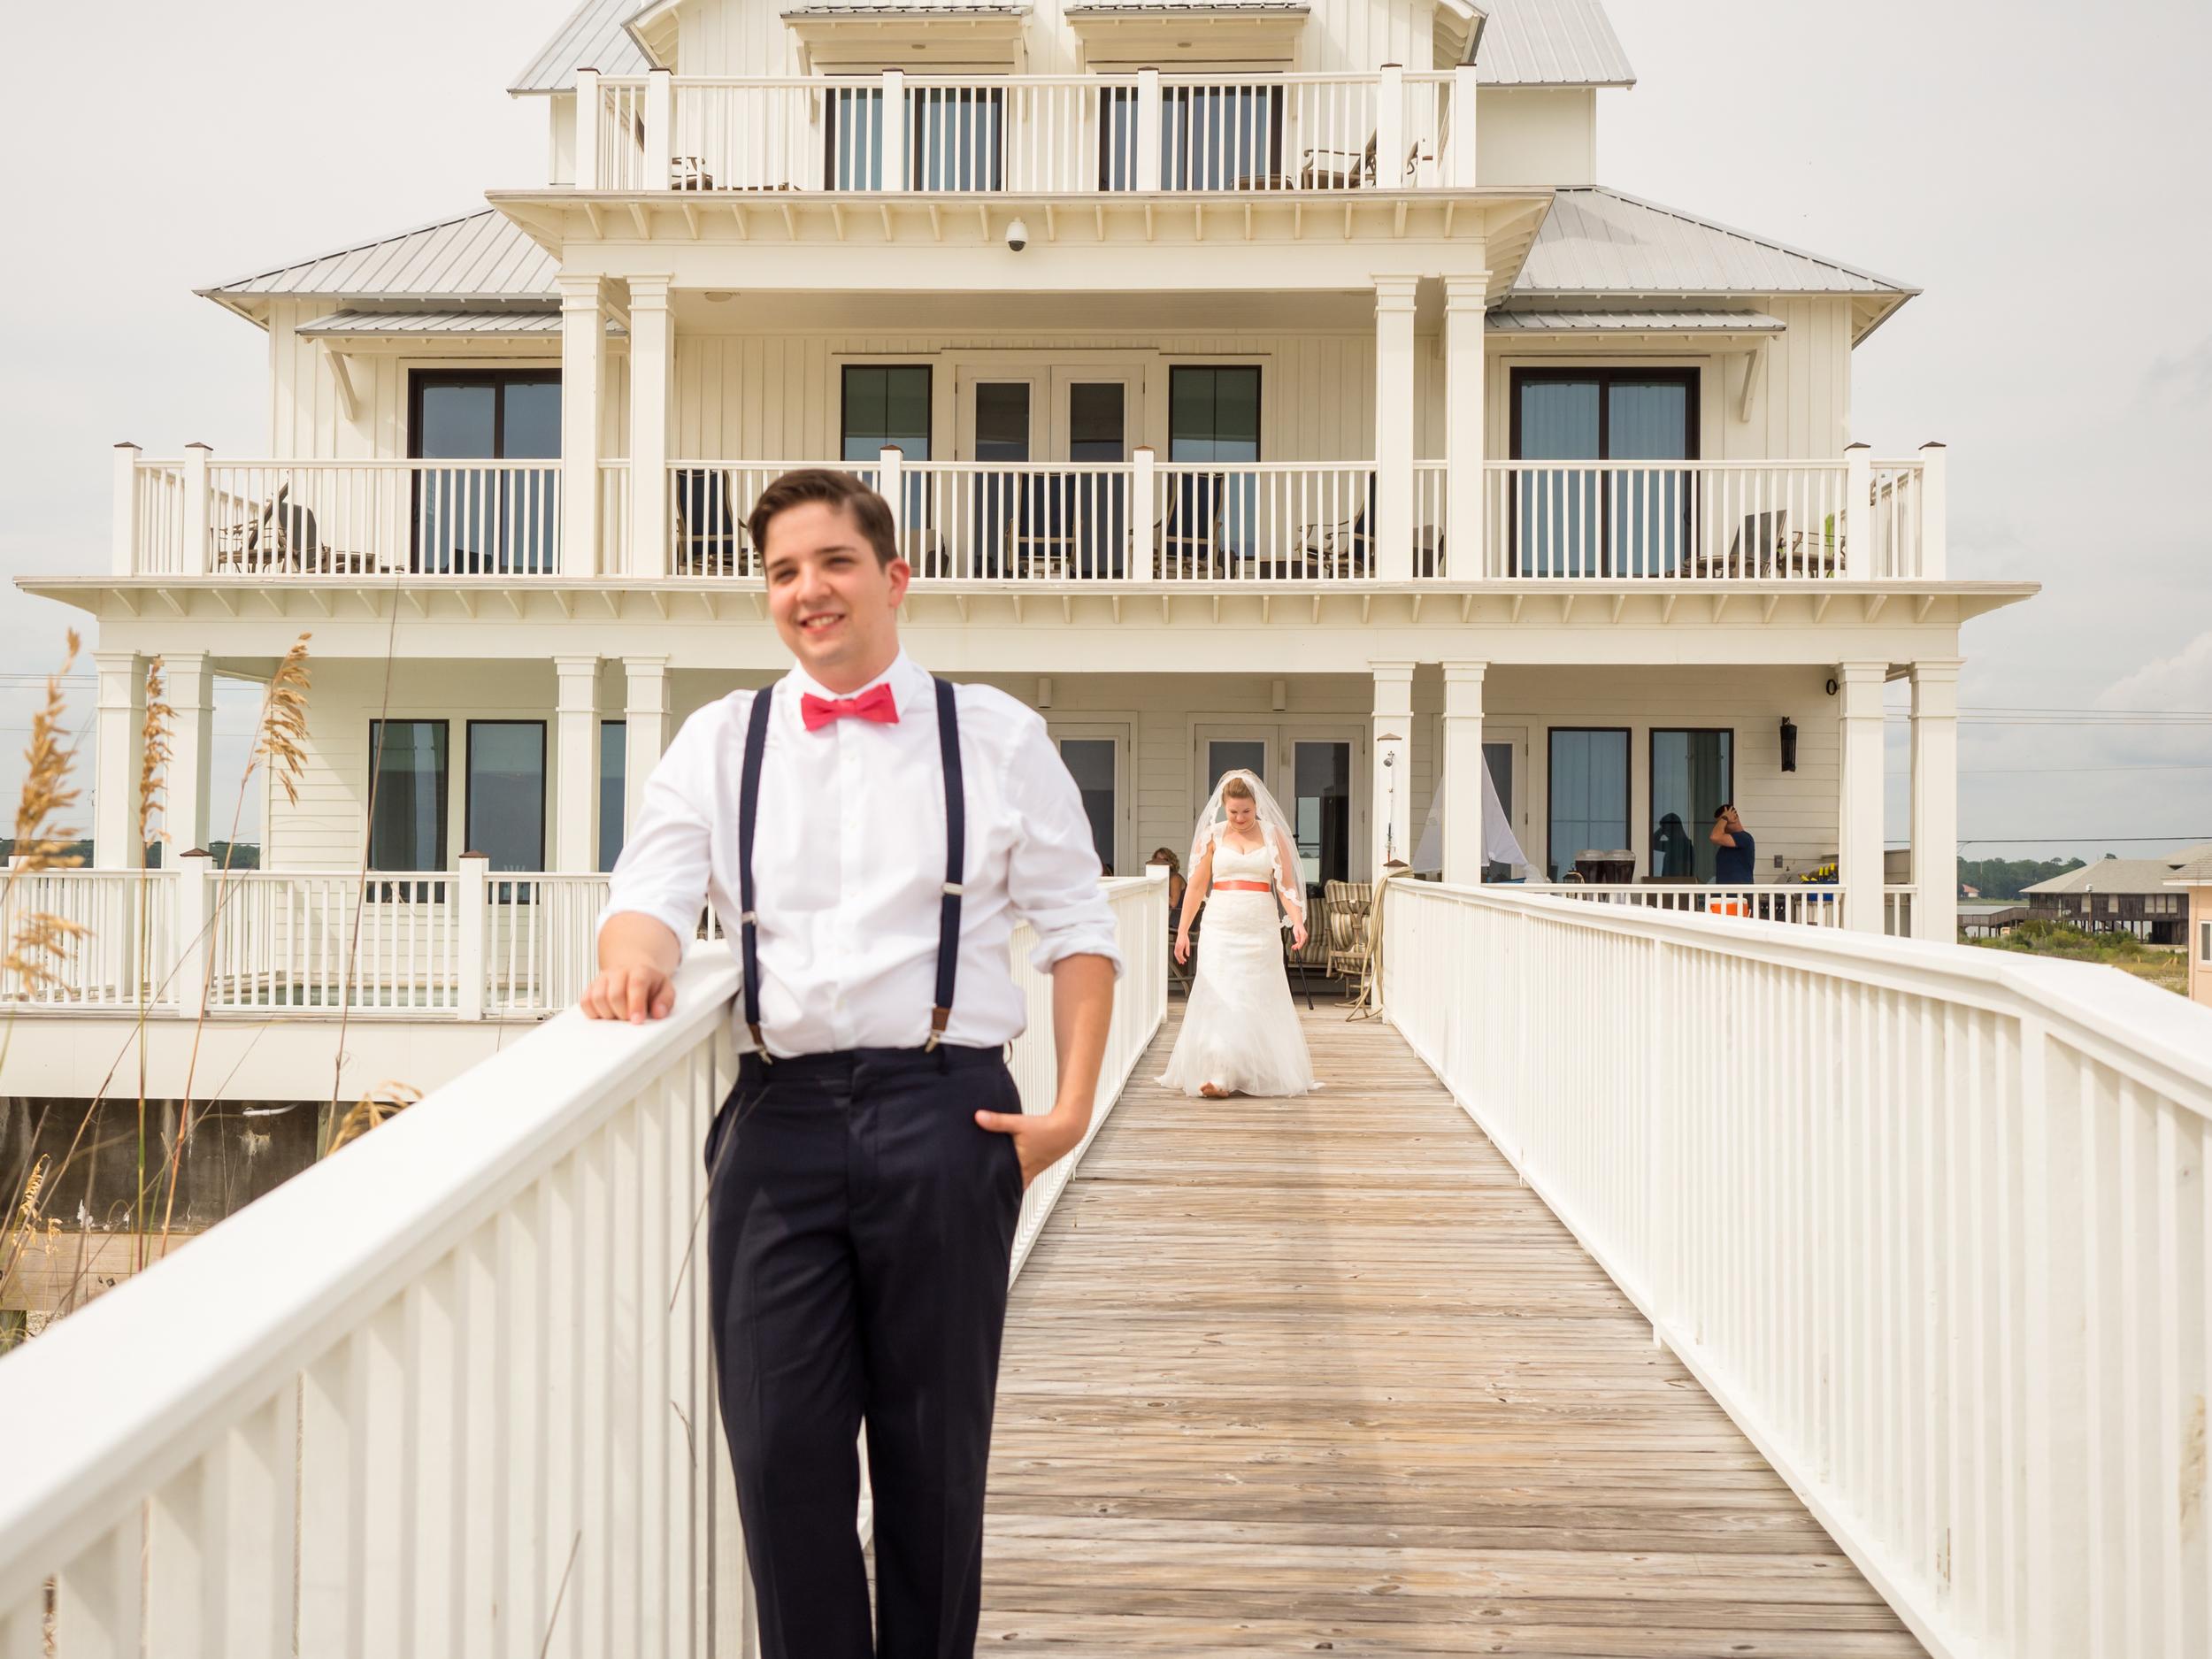 Sand Dollar Beach Weddings and Receptions